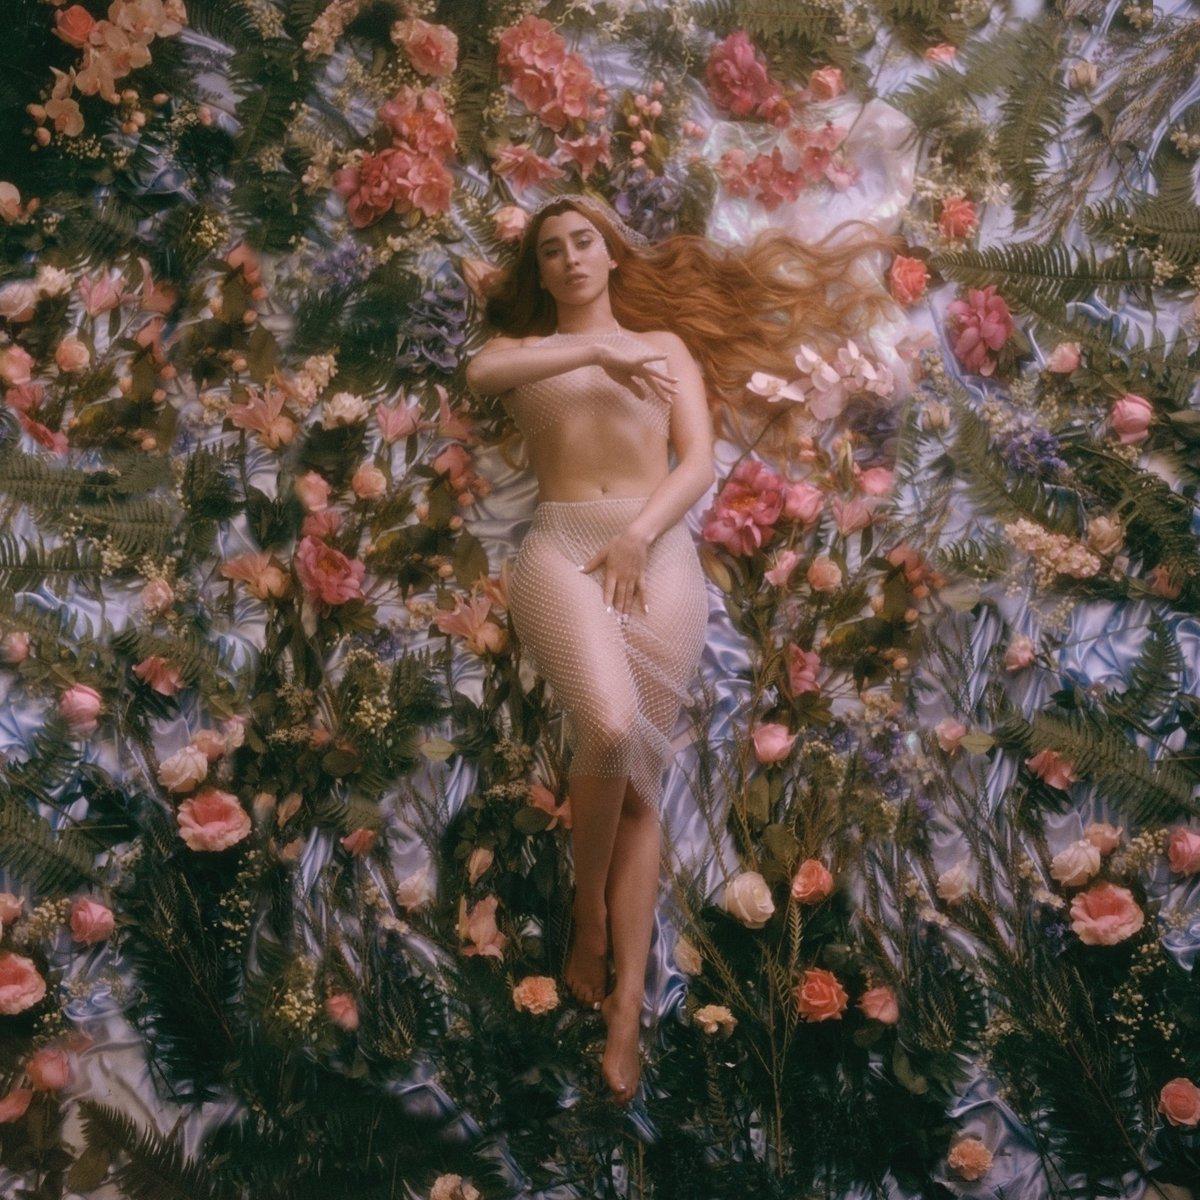 Una prueba más de que Lauren Jauregui pertenece a una obra de arte